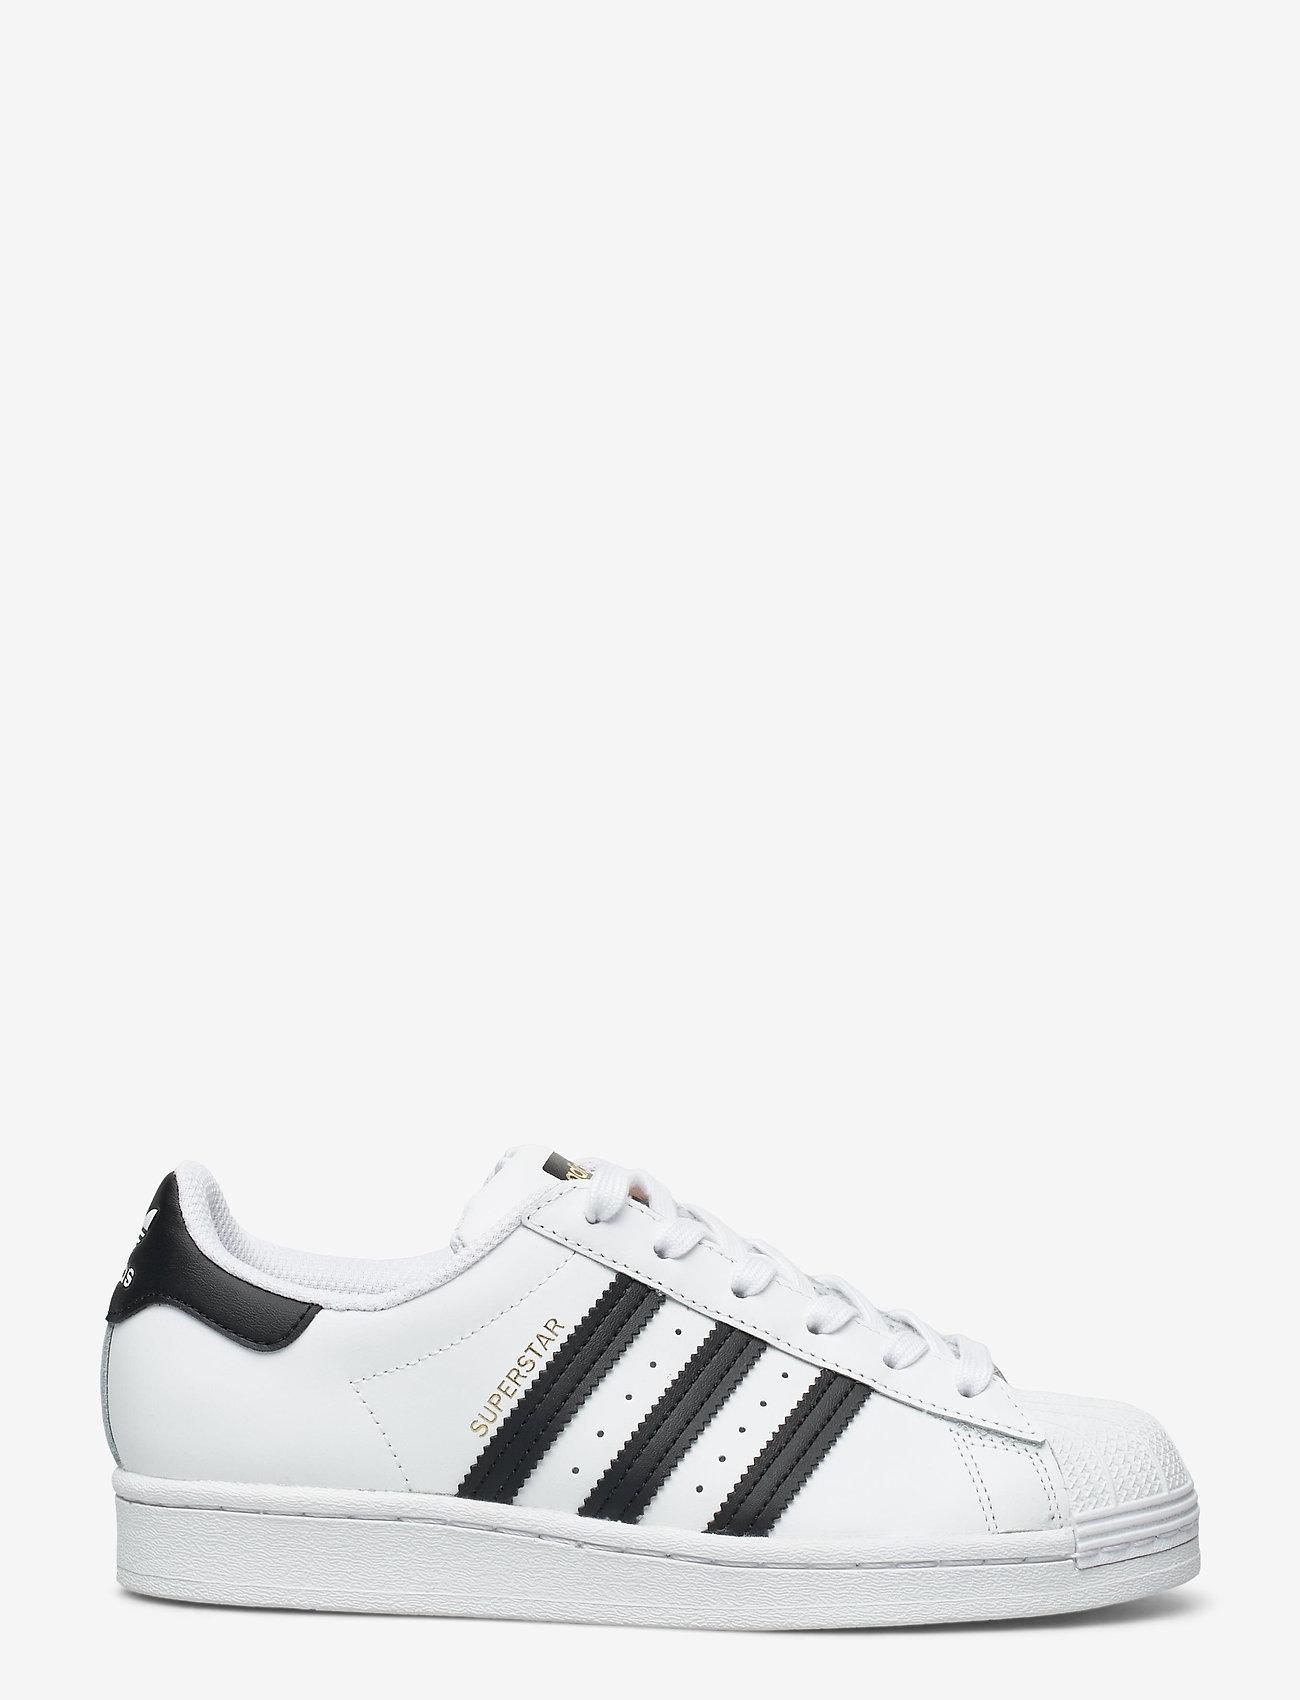 adidas Originals - Superstar  W - low top sneakers - ftwwht/cblack/ftwwht - 1